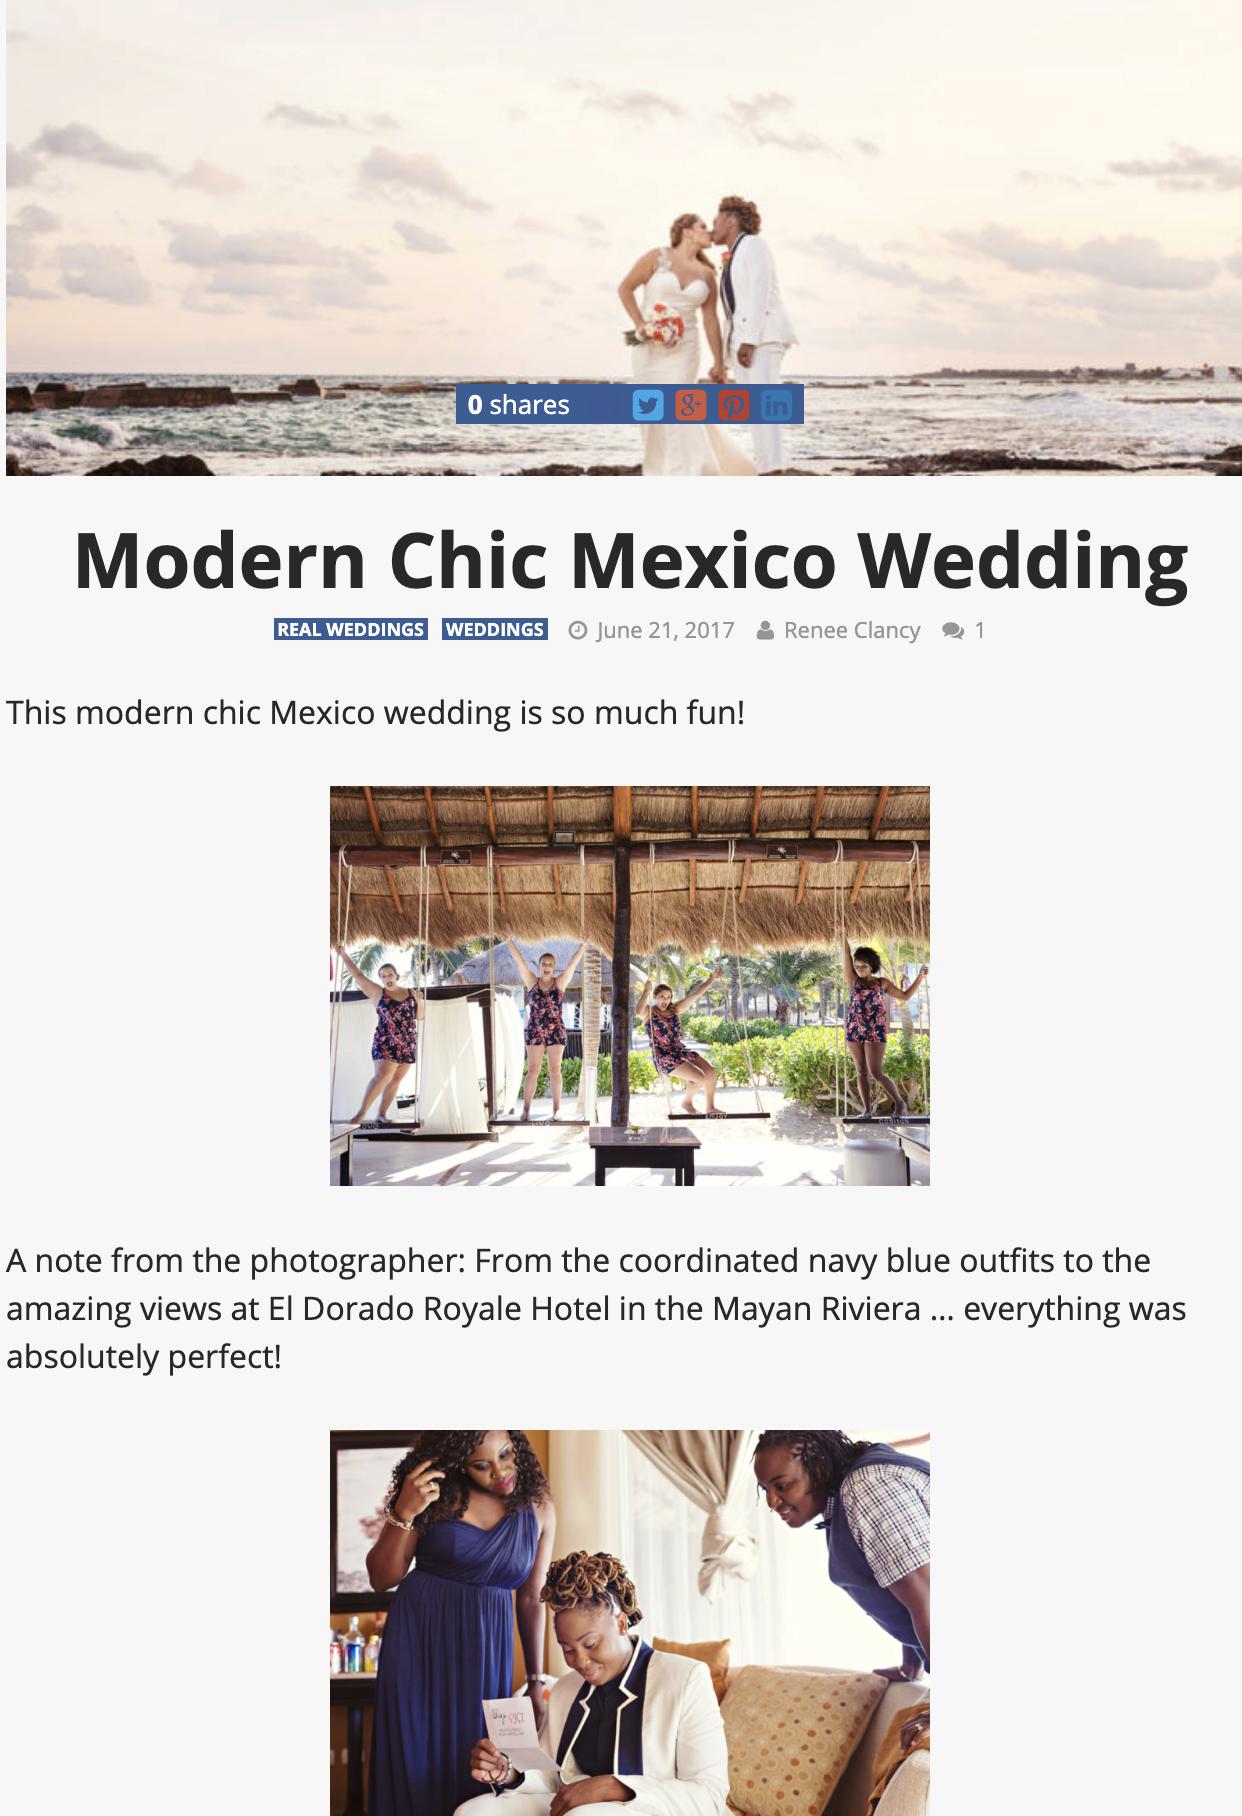 Modern Chic Mexico Wedding